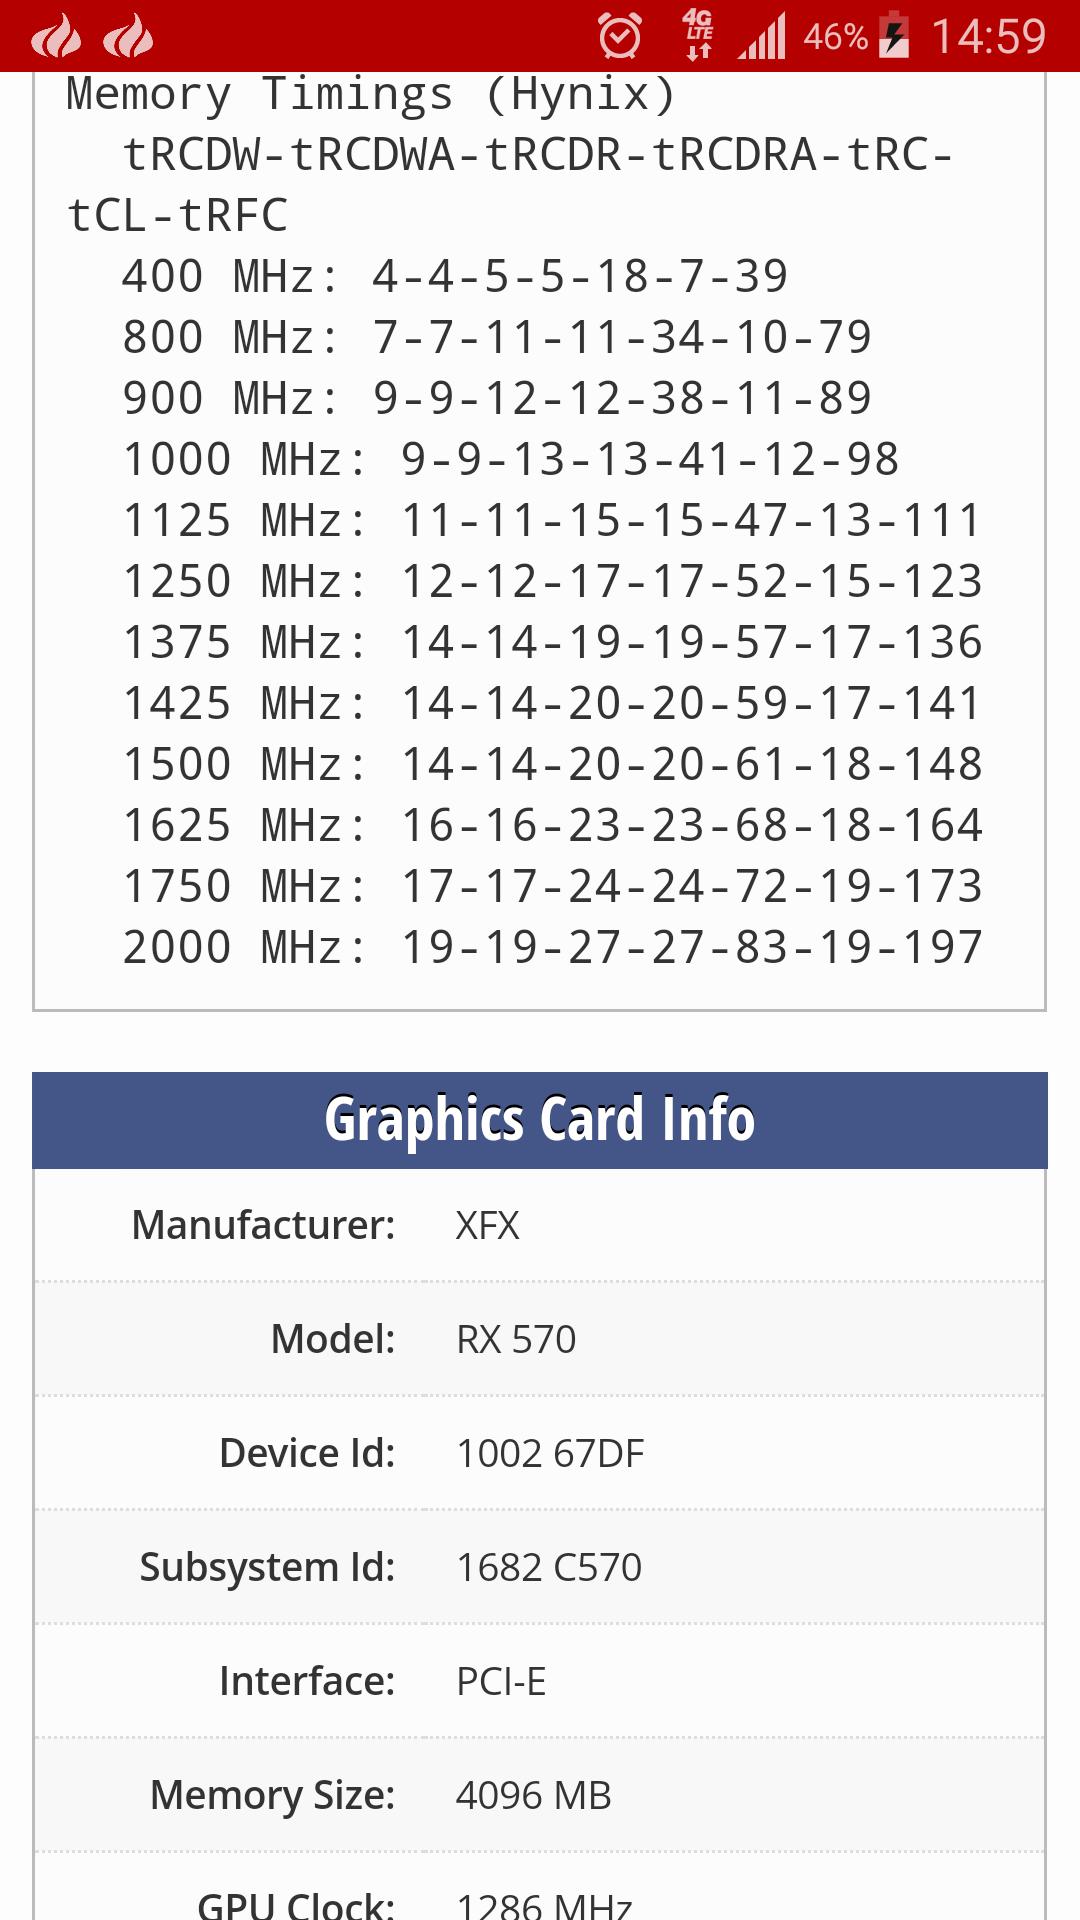 Screenshot_2020-03-25-14-59-30.png